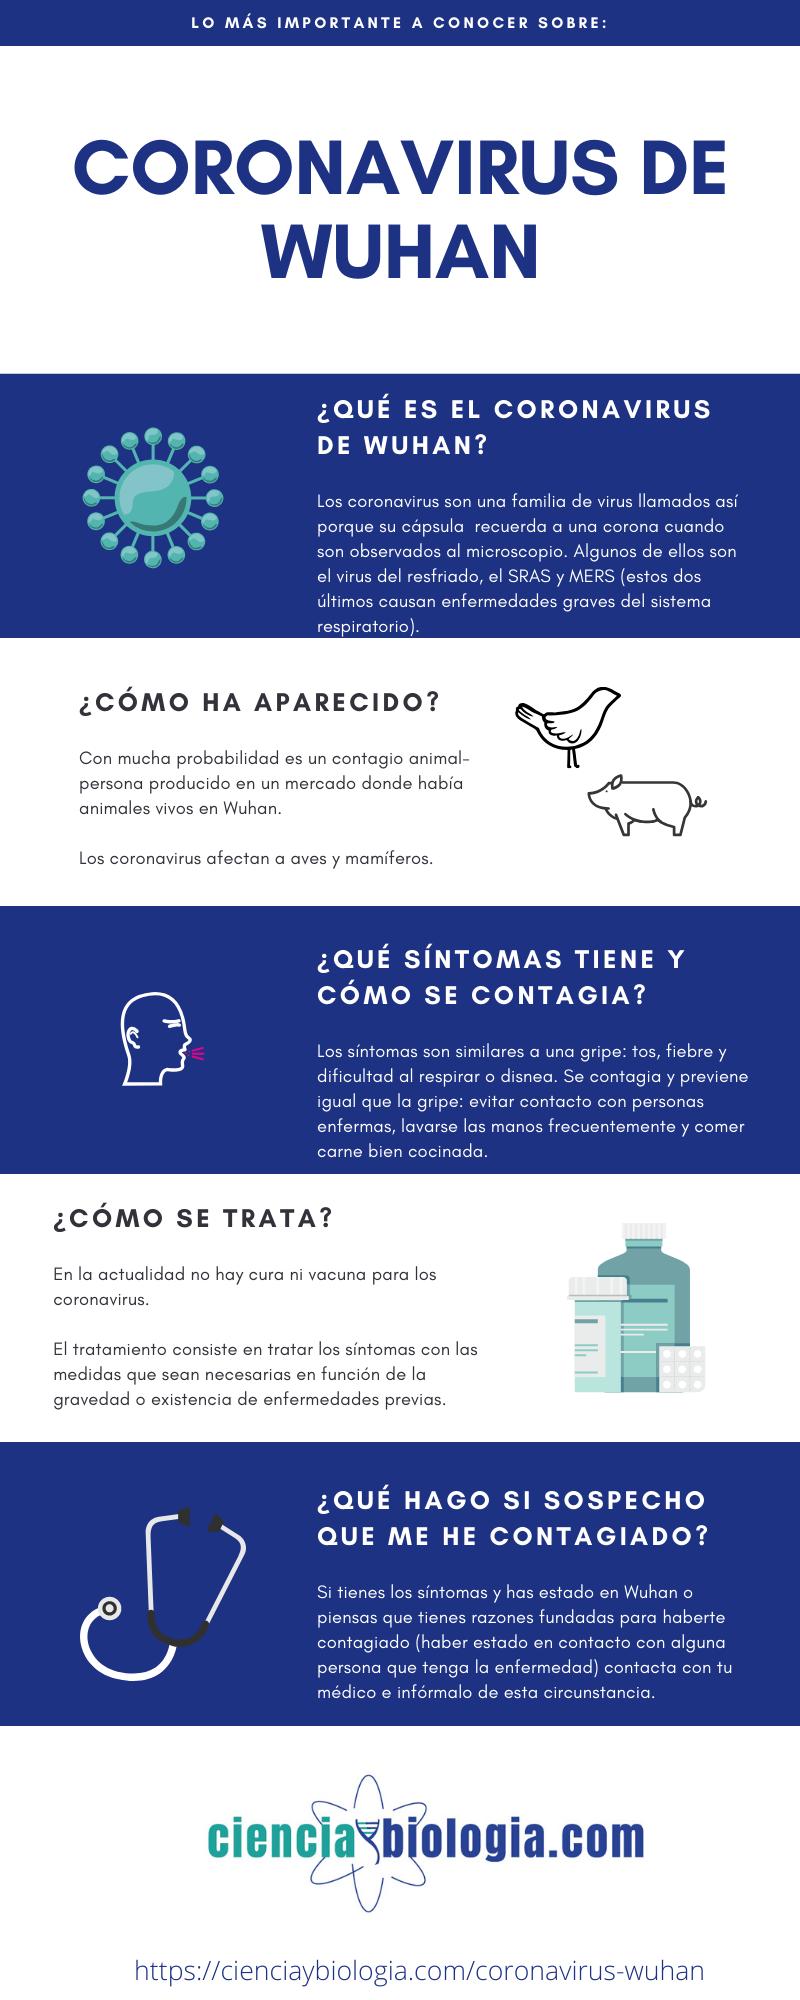 infografia coronavirus wuhan